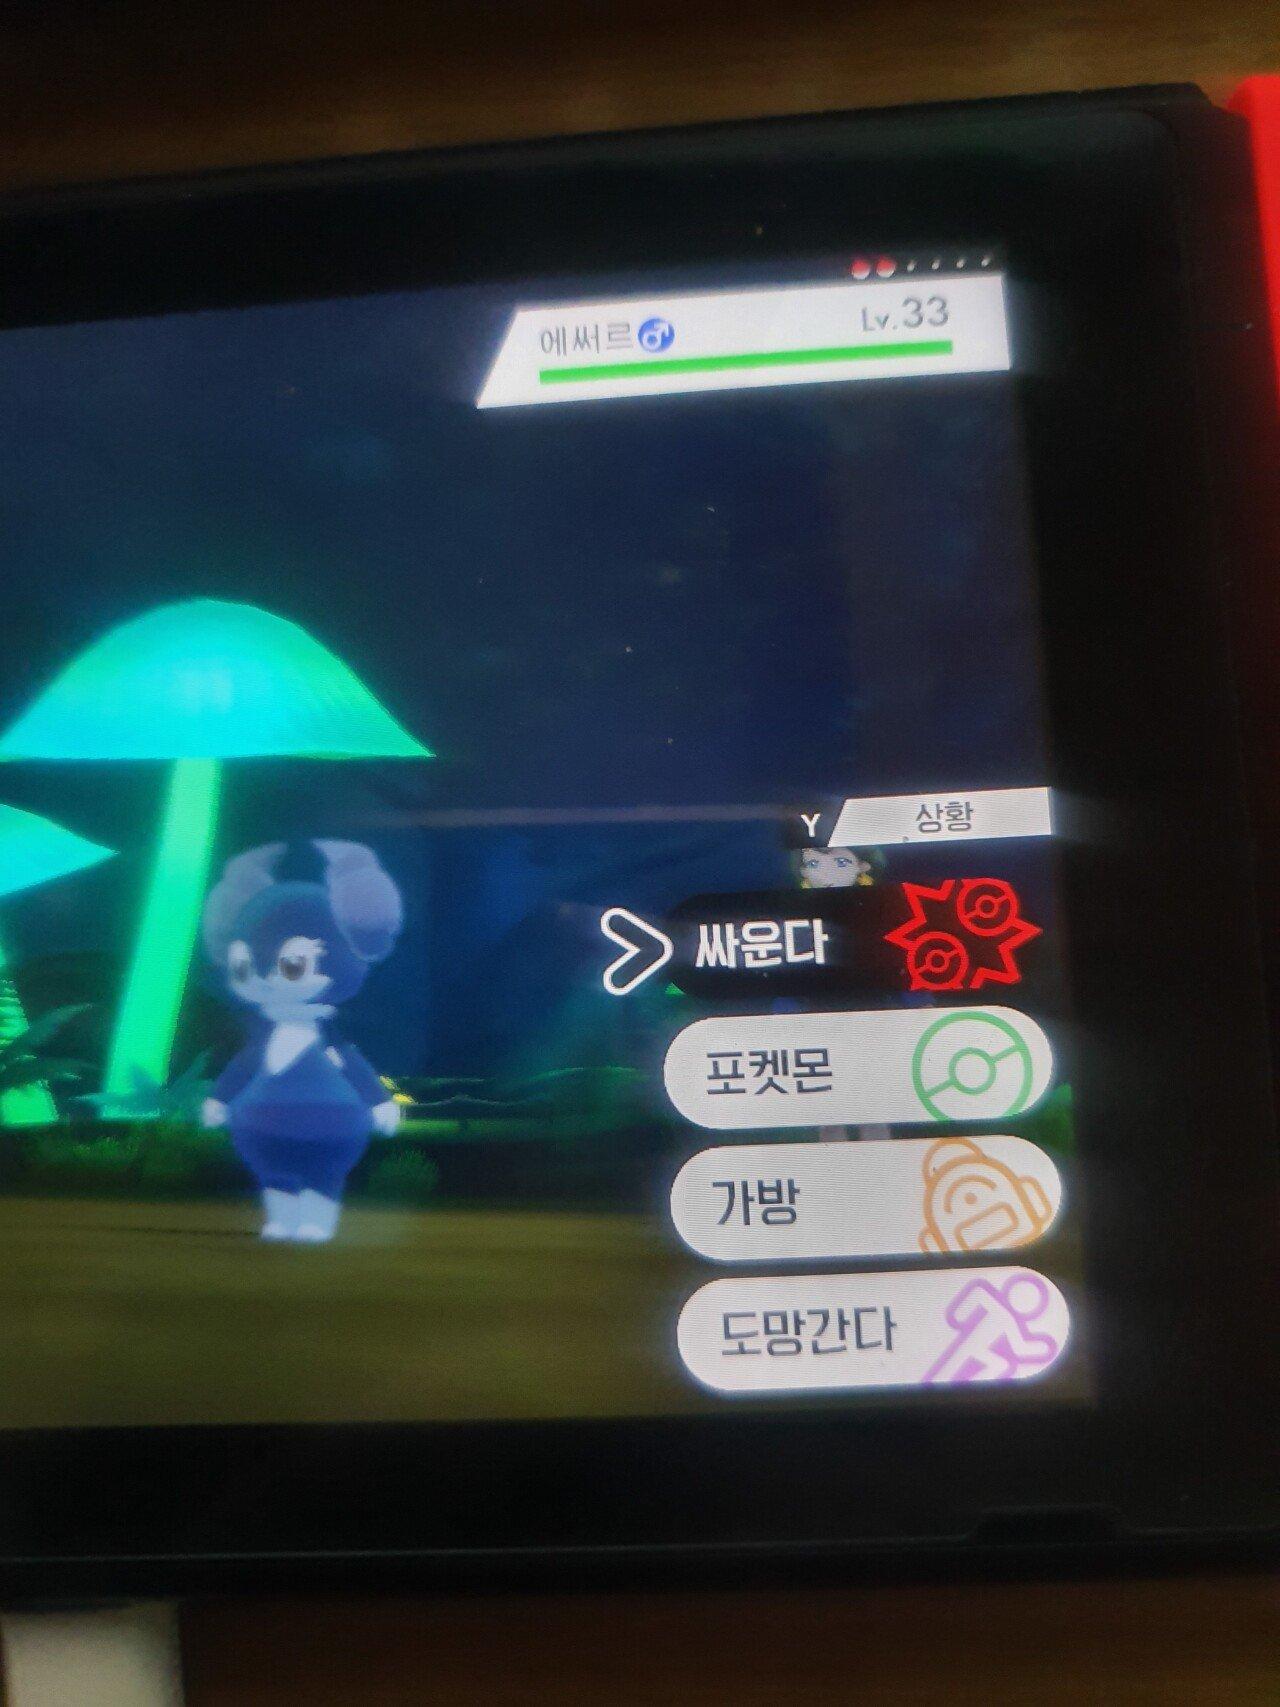 pokemon-20191112-122609-000.jpg 포켓몬 신작 신규 포켓몬 한글이름들.jpg